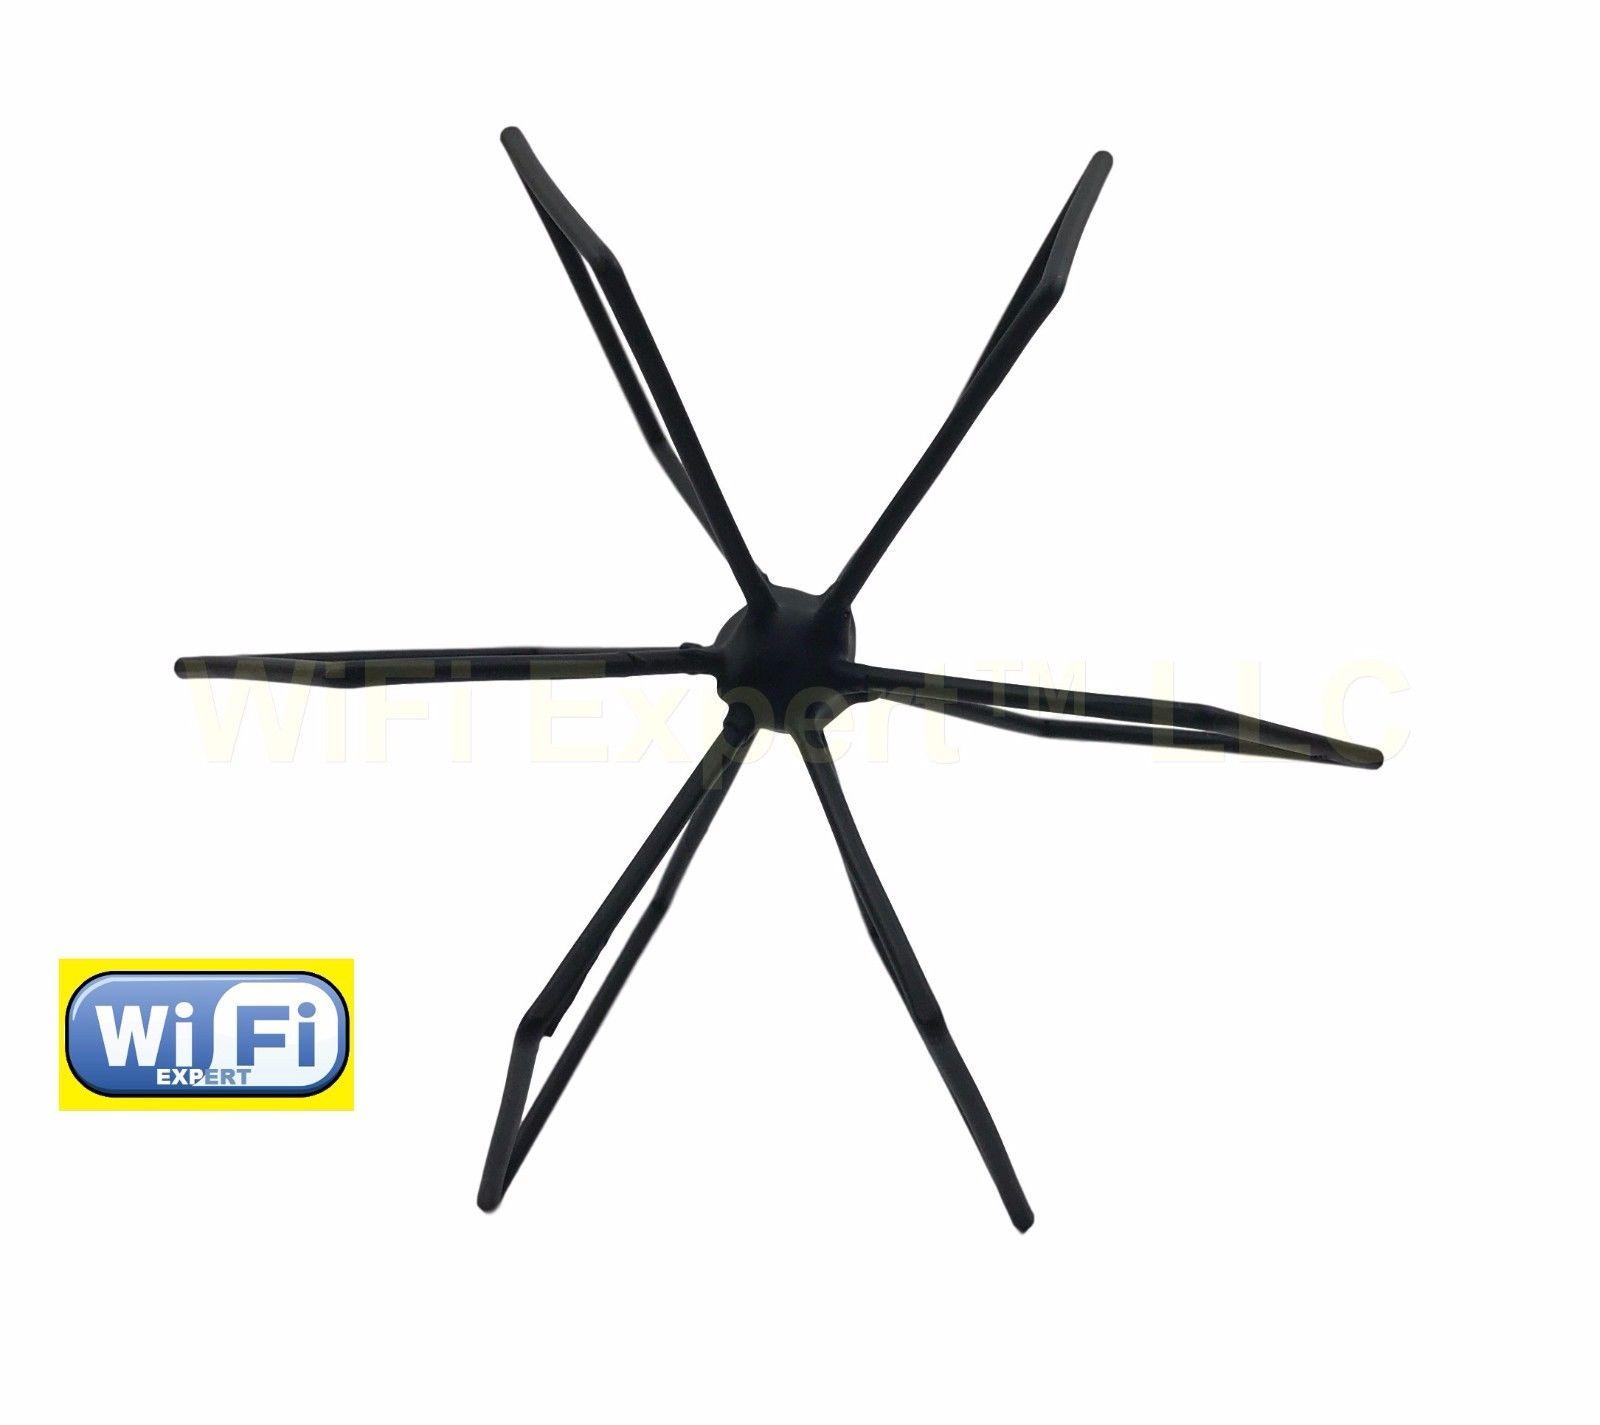 Wifi Antenna 2 4ghz Omni Triple Biquad Mach 4b Antenna For